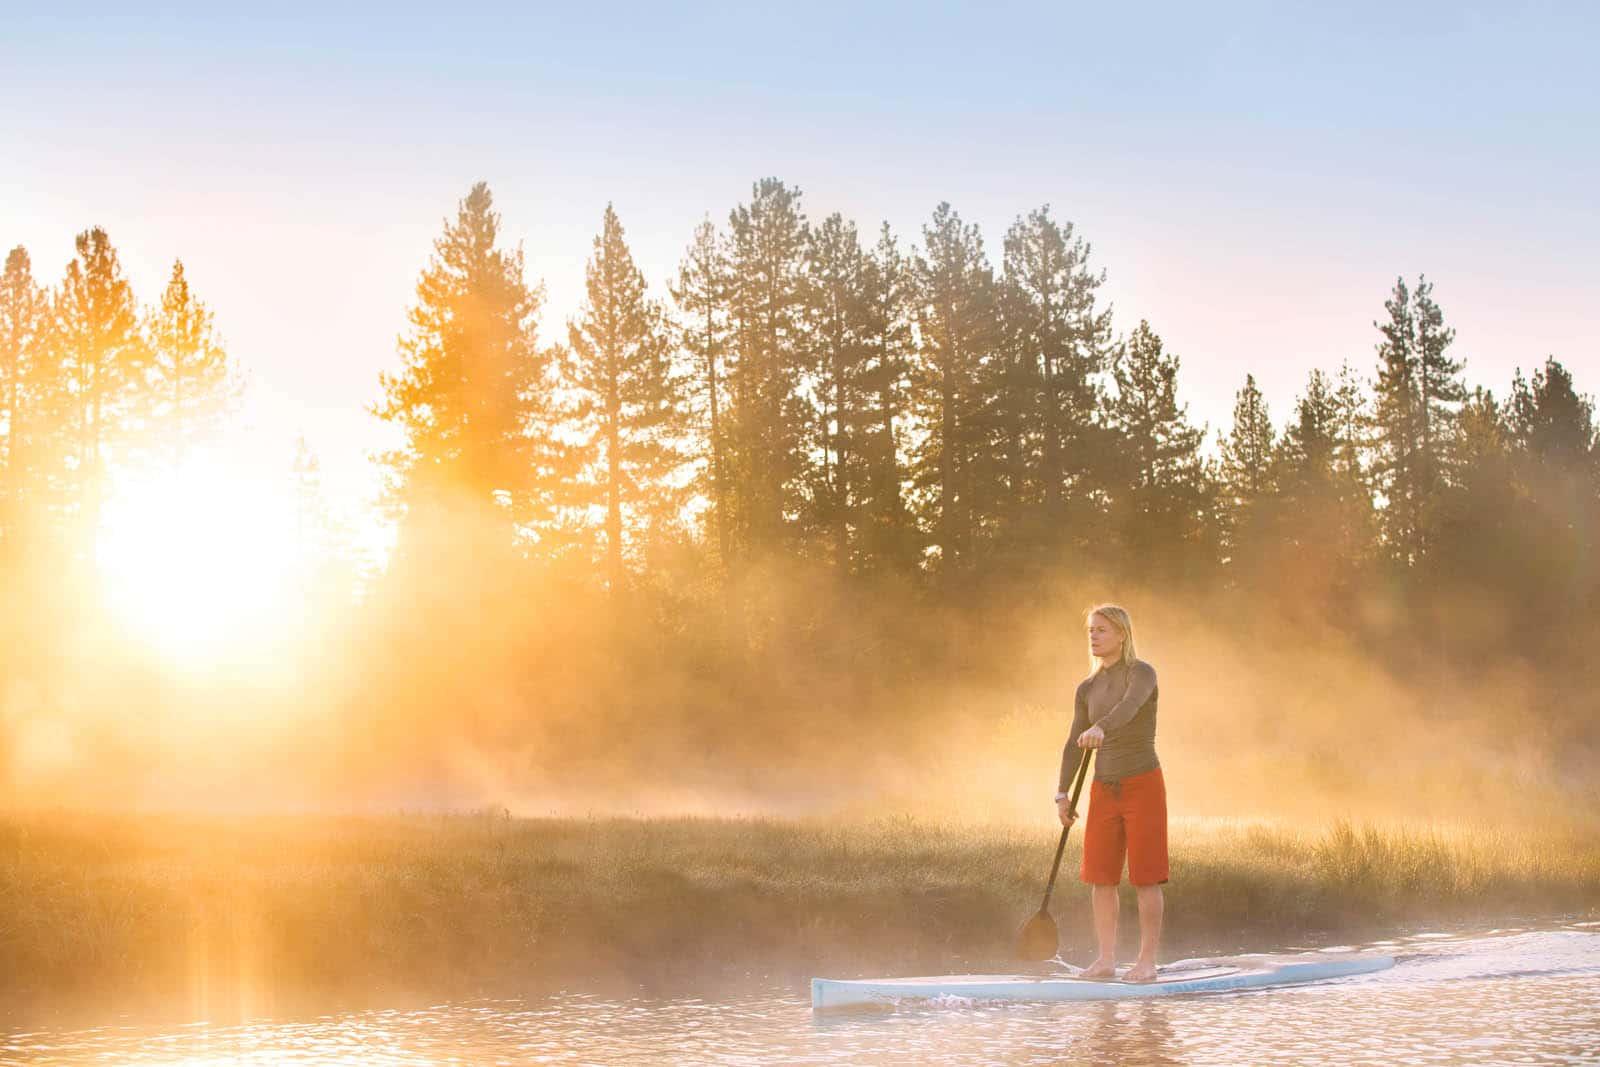 Lel Tone enjoying an early morning paddle on Lake Tahoe.